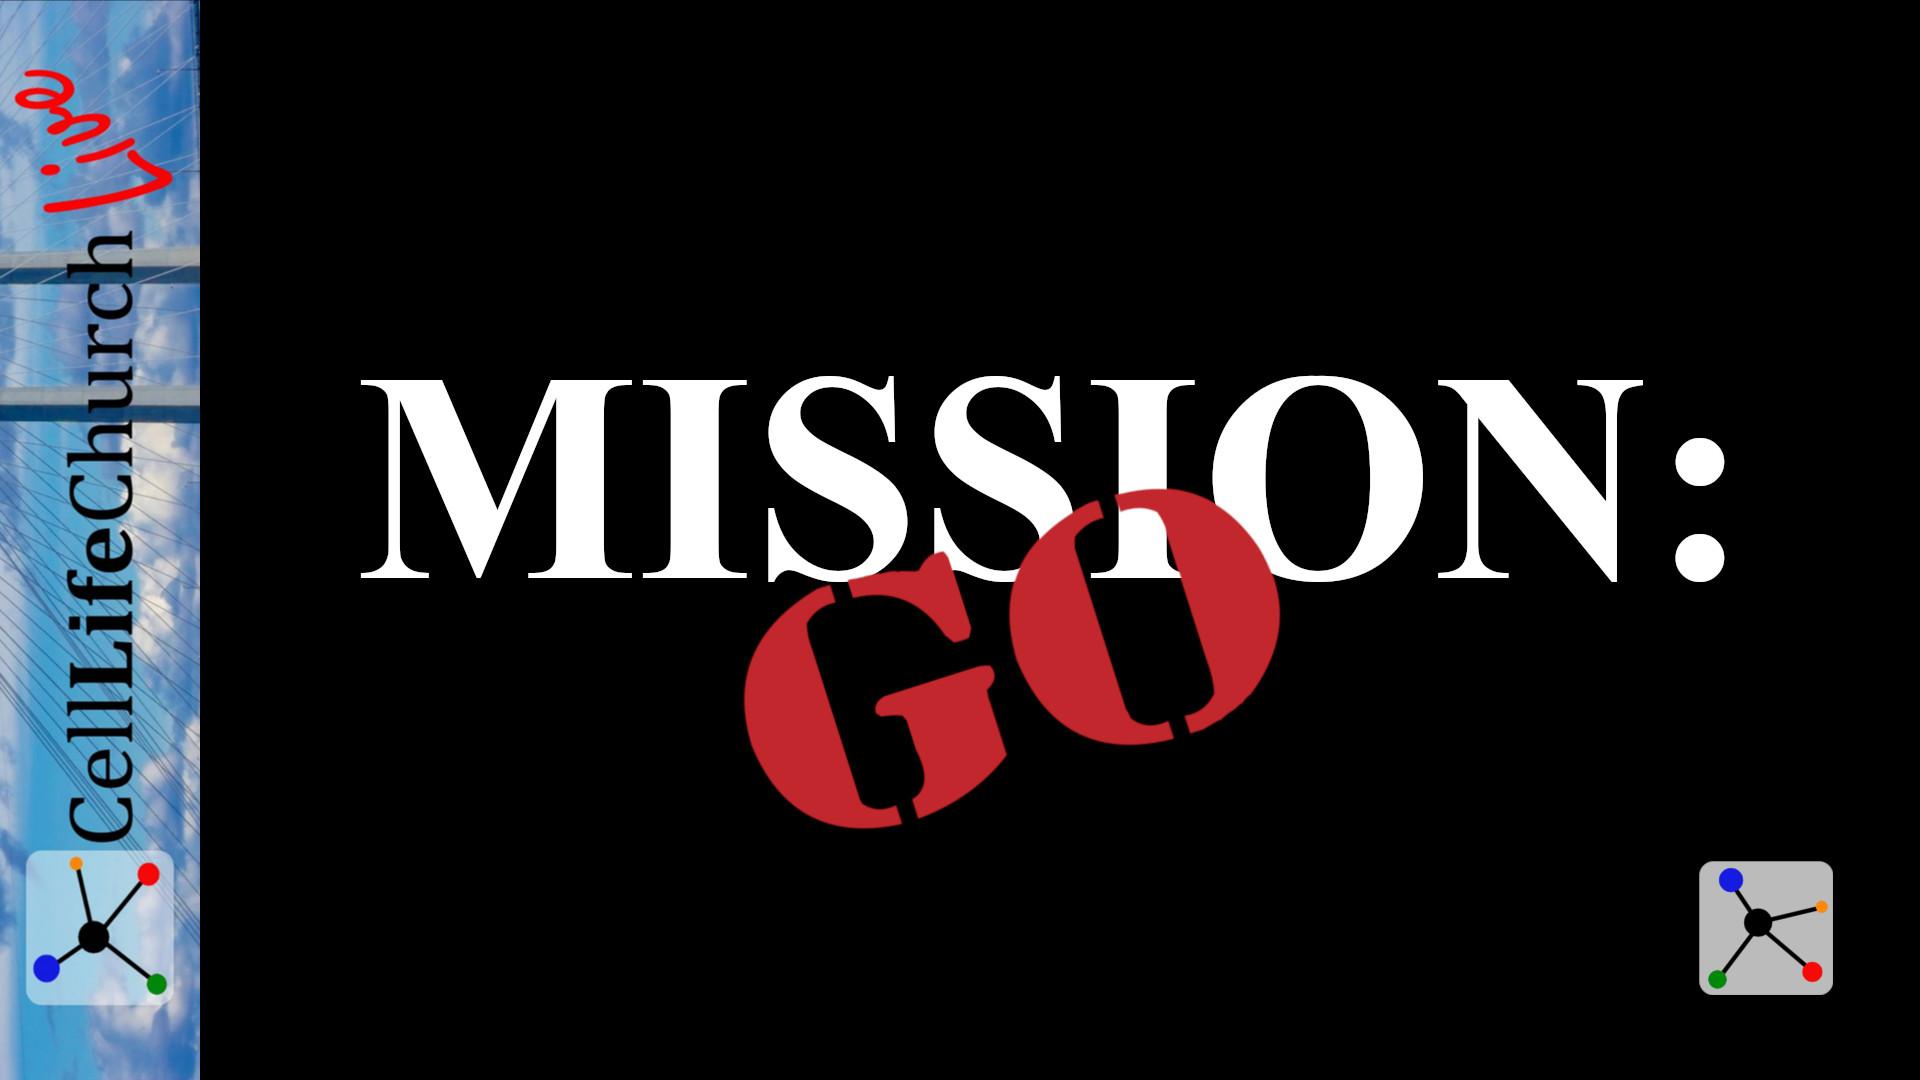 Mission: Go